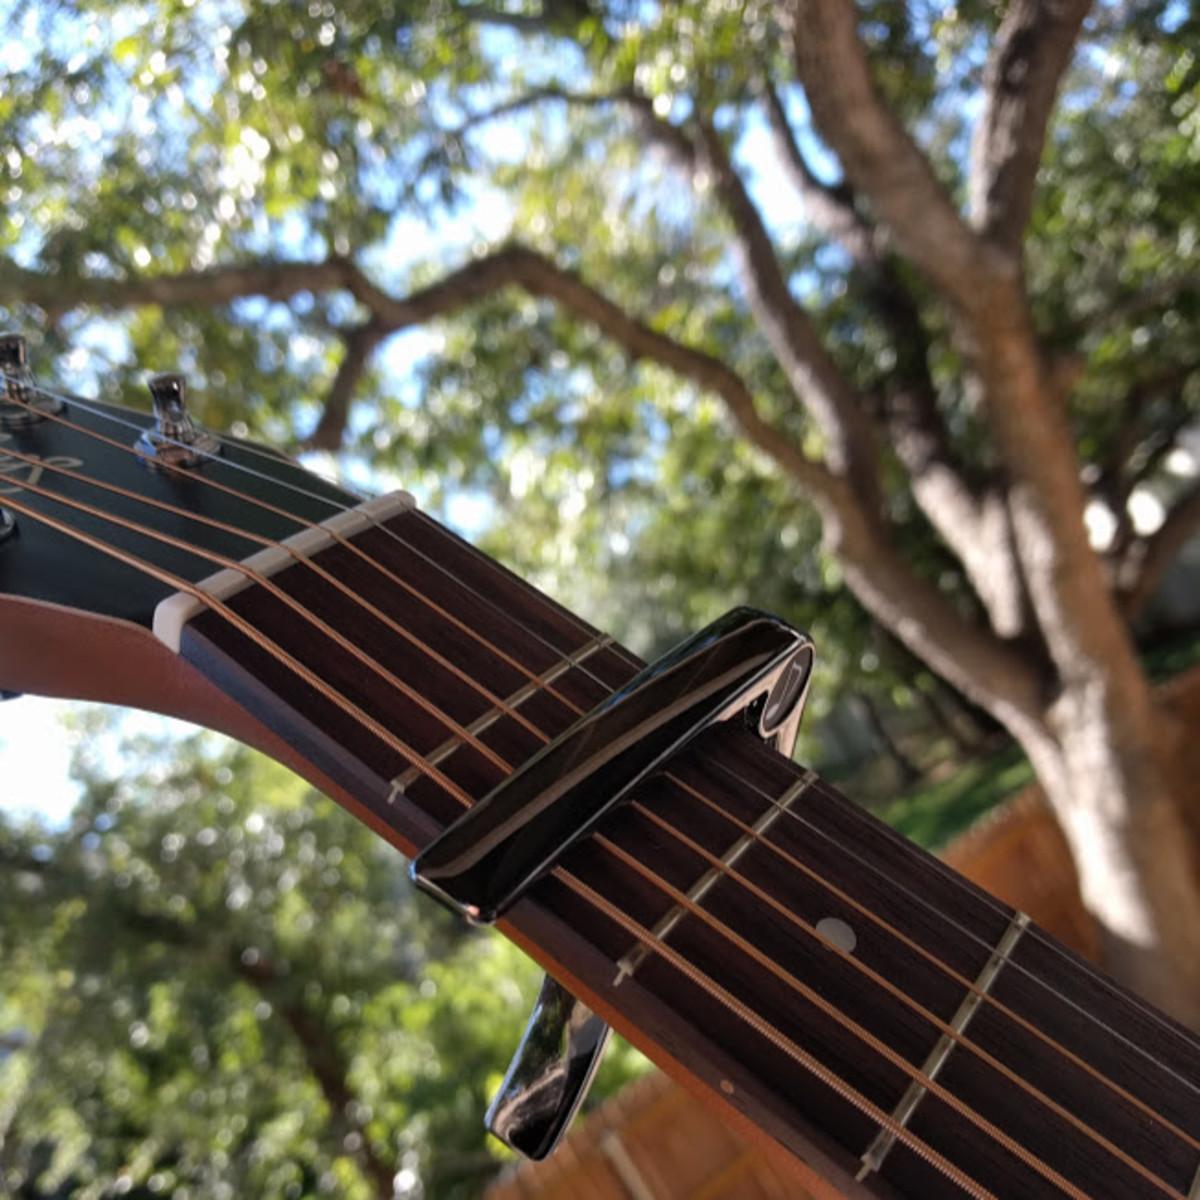 Capo on guitar.